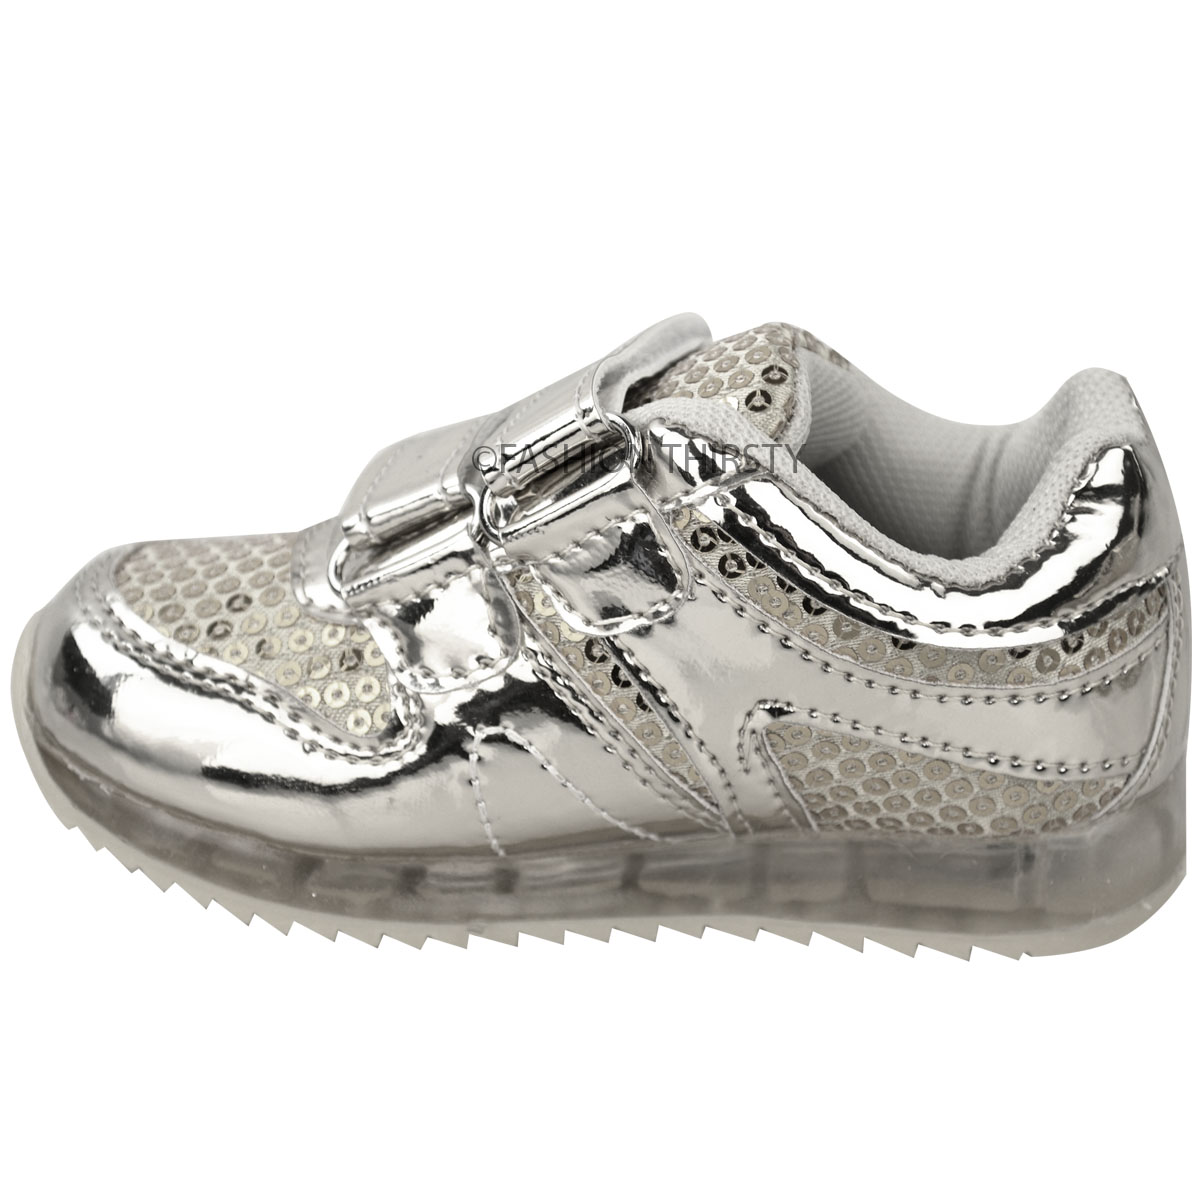 Converse Light Up Shoes Ebay